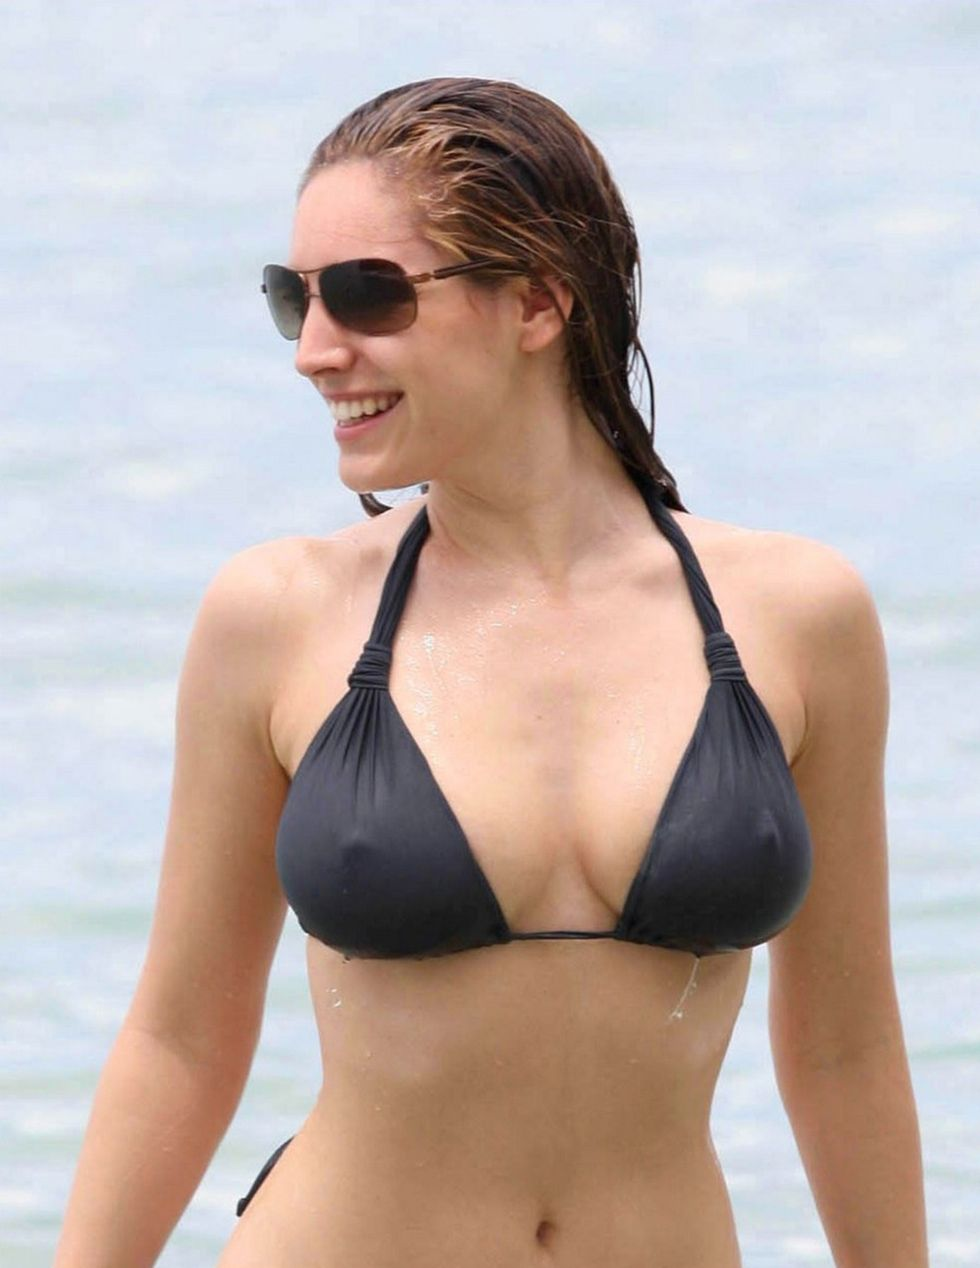 kelly-brook-bikini-candids-at-the-beach-in-barbados-01